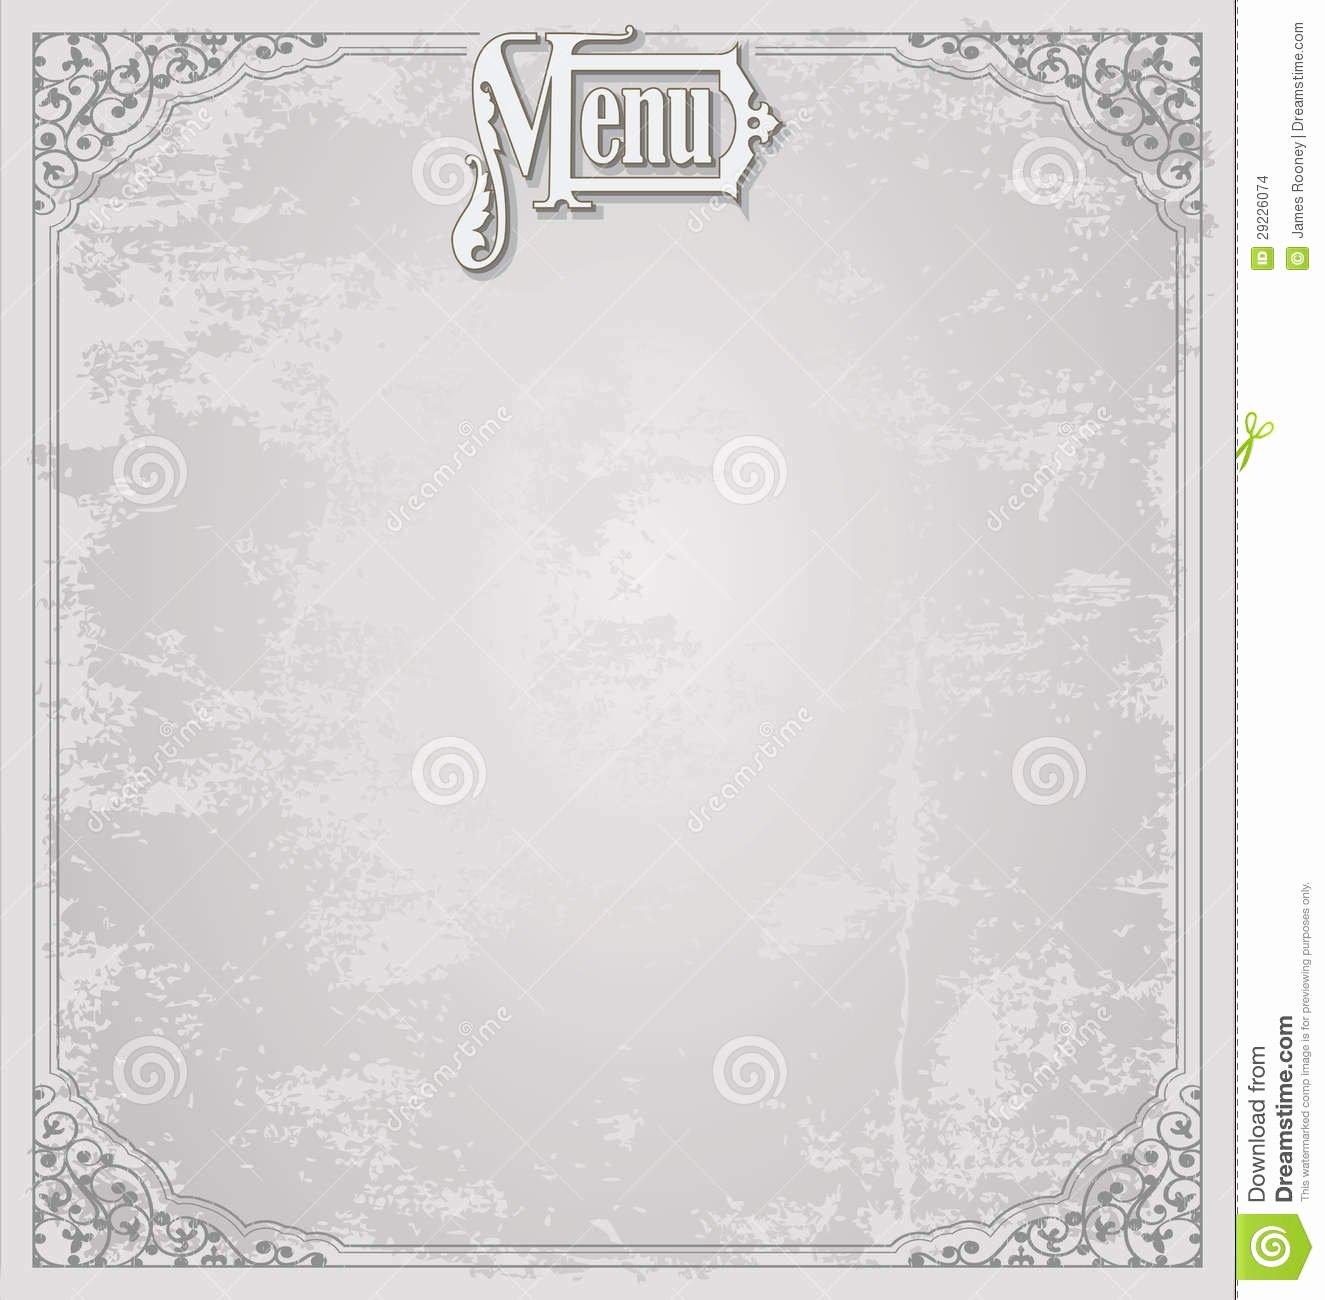 Free Blank Menu Templates Lovely Menu Design Template Stock Illustration Illustration Of